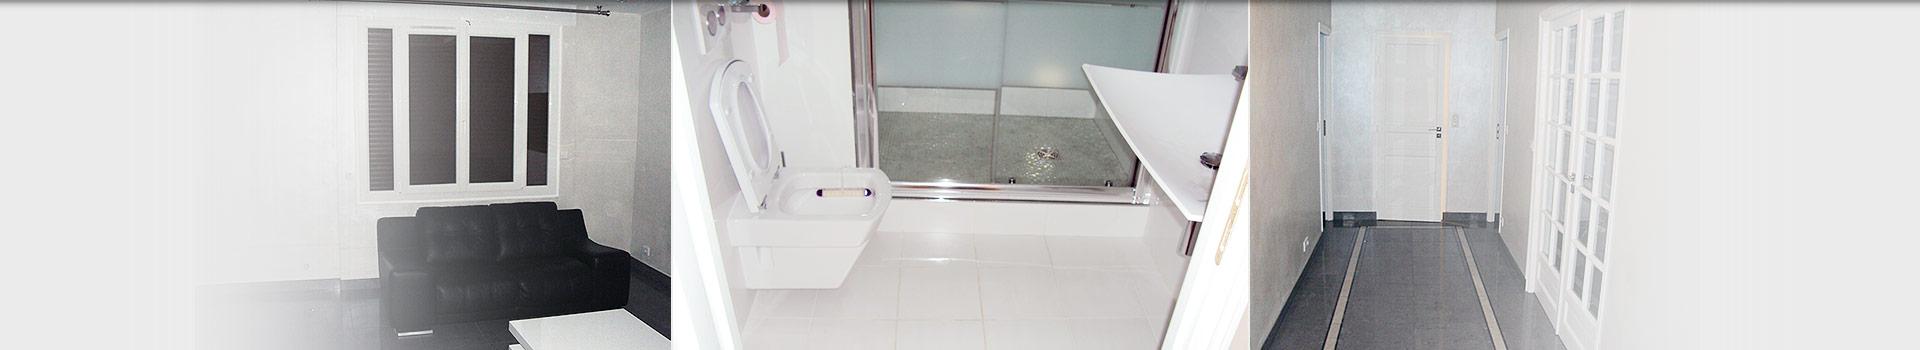 renover-appartement-paris-75020